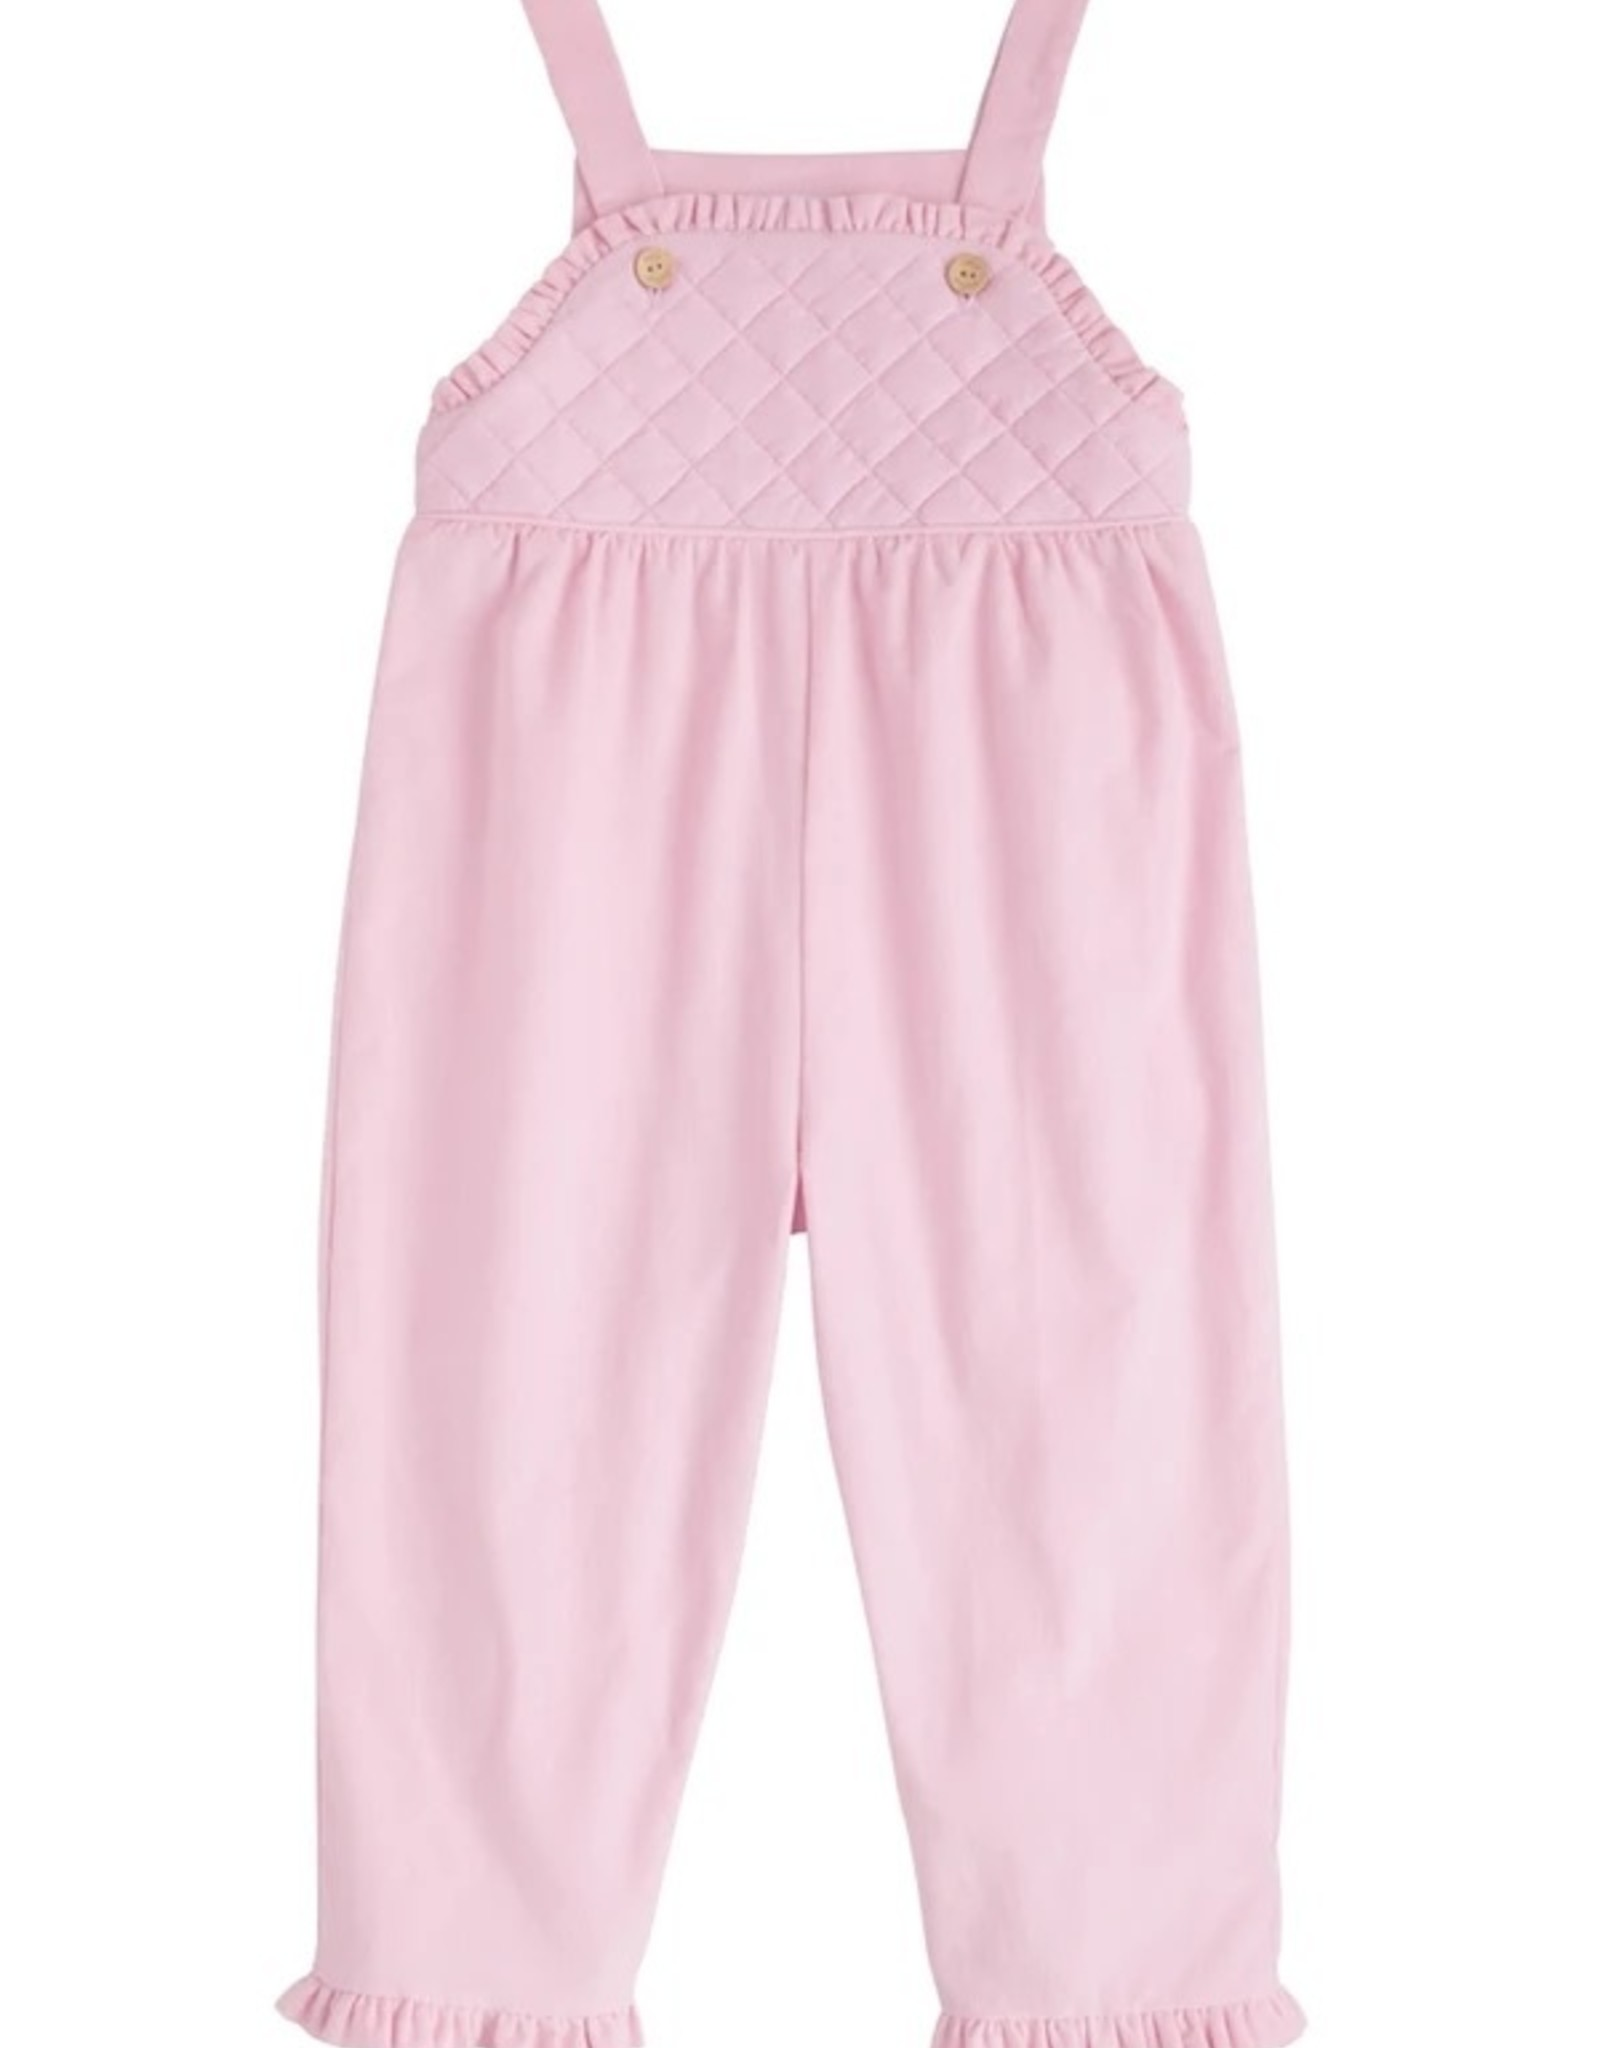 Little English Light Pink Ruffled Overall